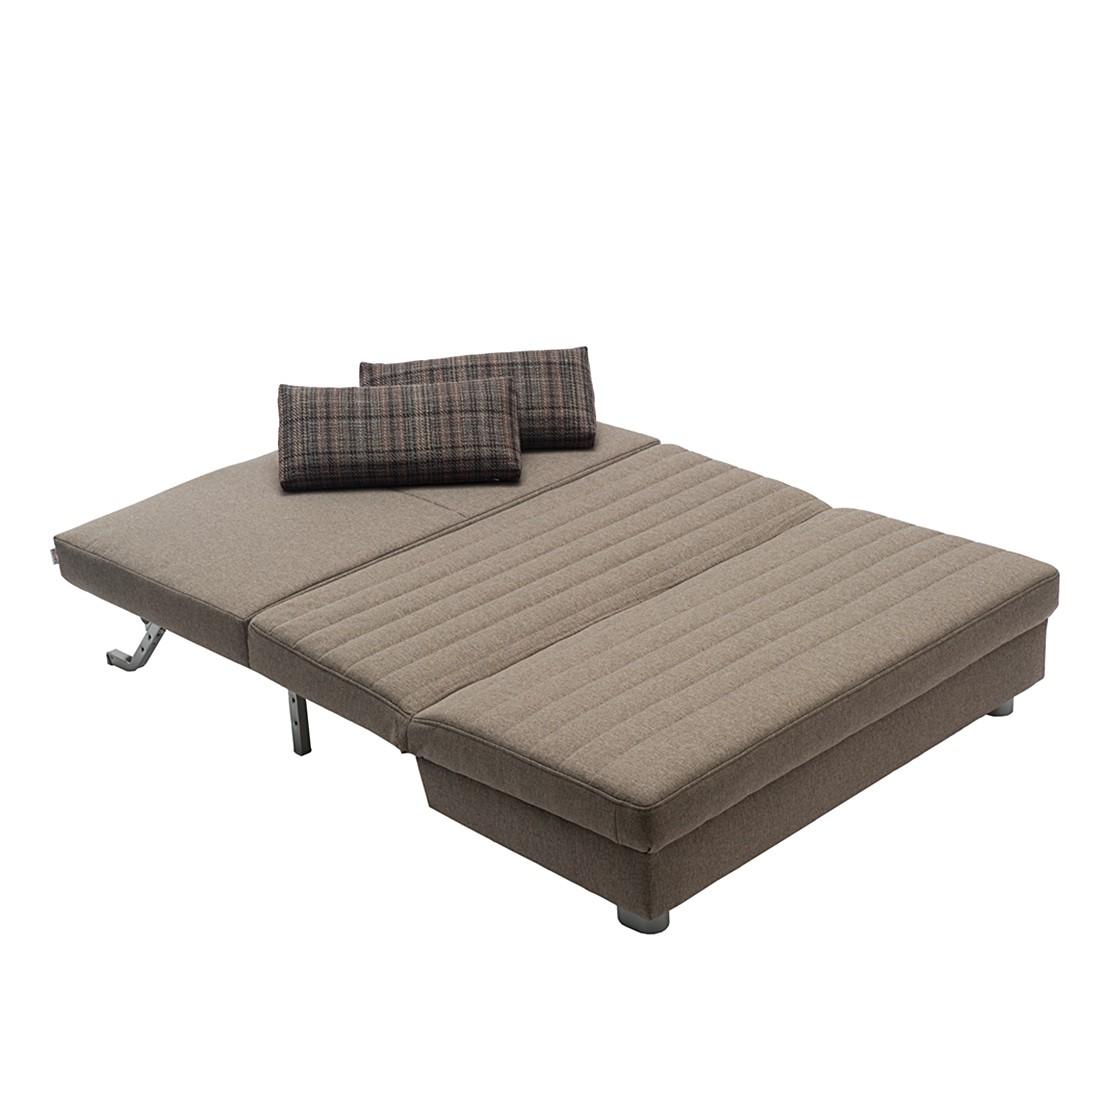 schlafcouch petra webstoff braun breite 140 cm. Black Bedroom Furniture Sets. Home Design Ideas